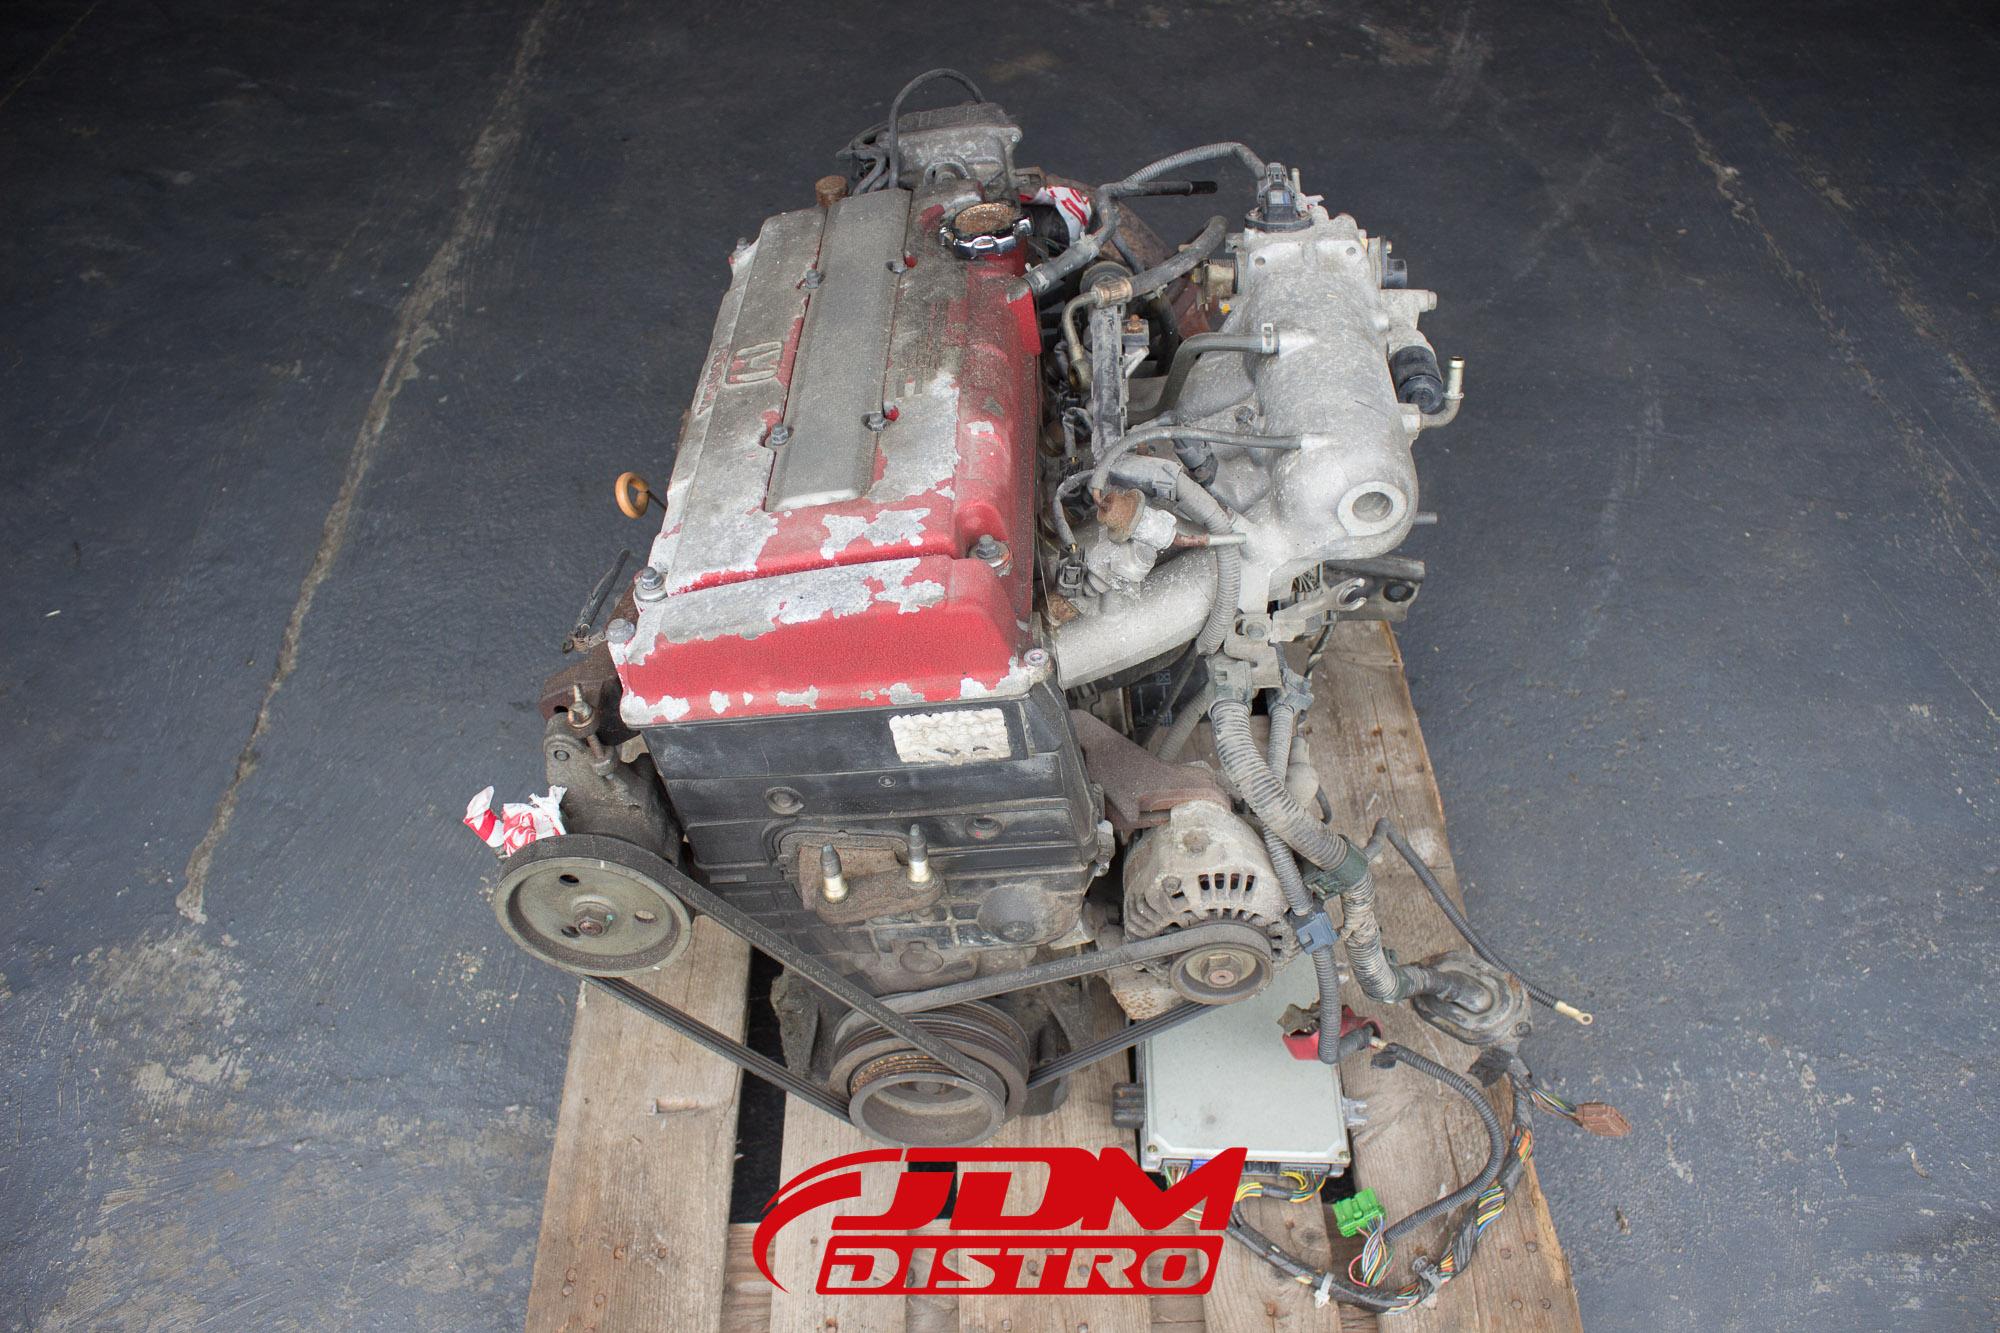 HONDA CIVIC TYPE-R EK9 B16B ENGINE AND S4C GEARBOX - JDMDistro - Buy JDM Parts Online Worldwide ...